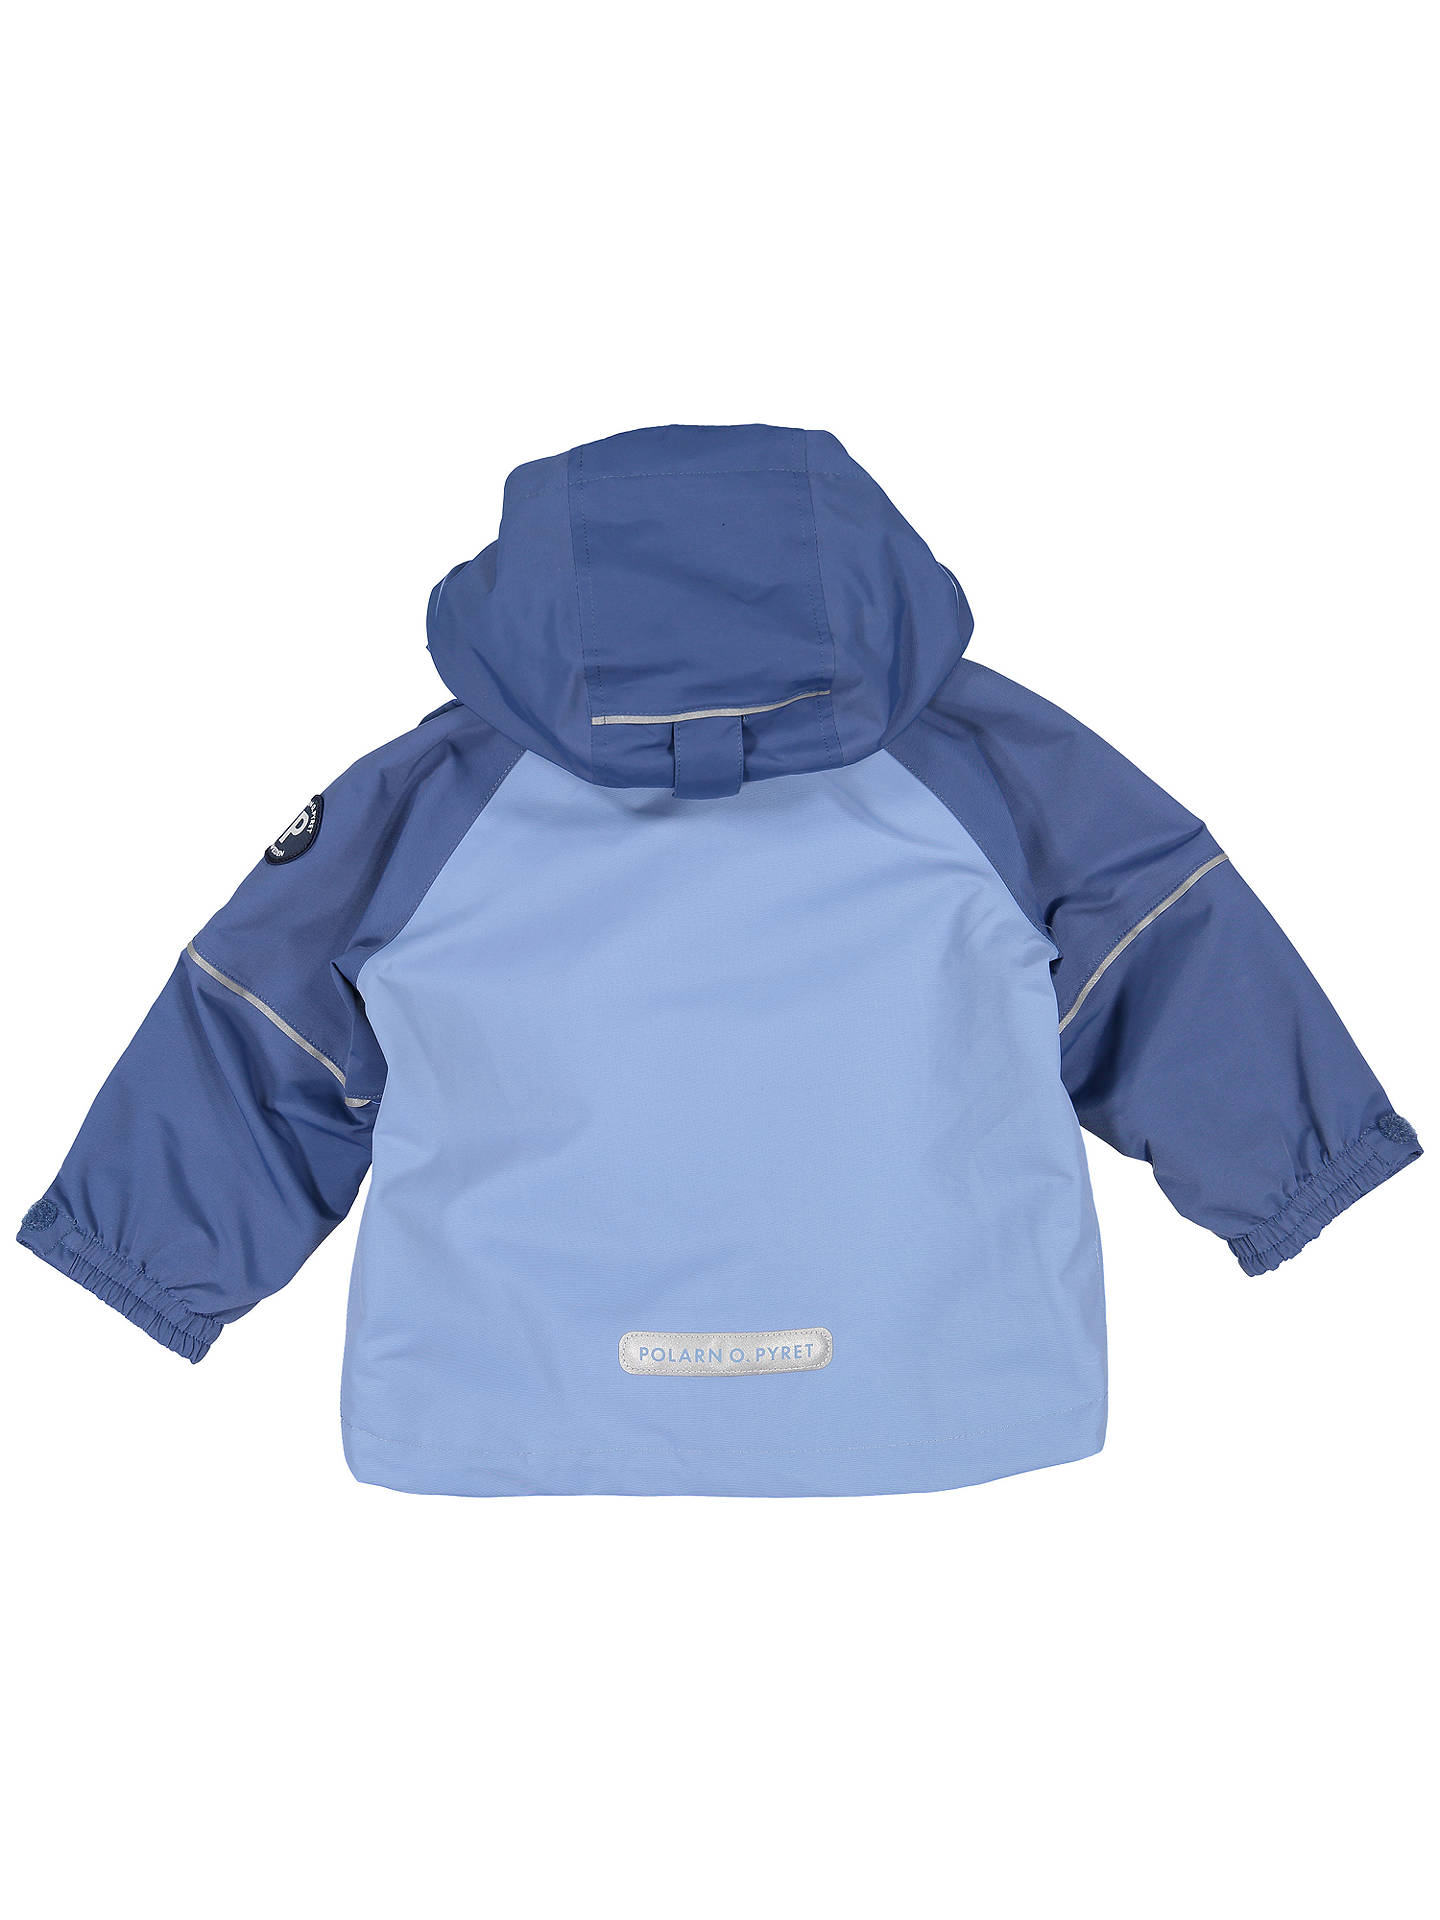 af8e0304d794 Polarn O. Pyret Baby Shell Coat at John Lewis   Partners